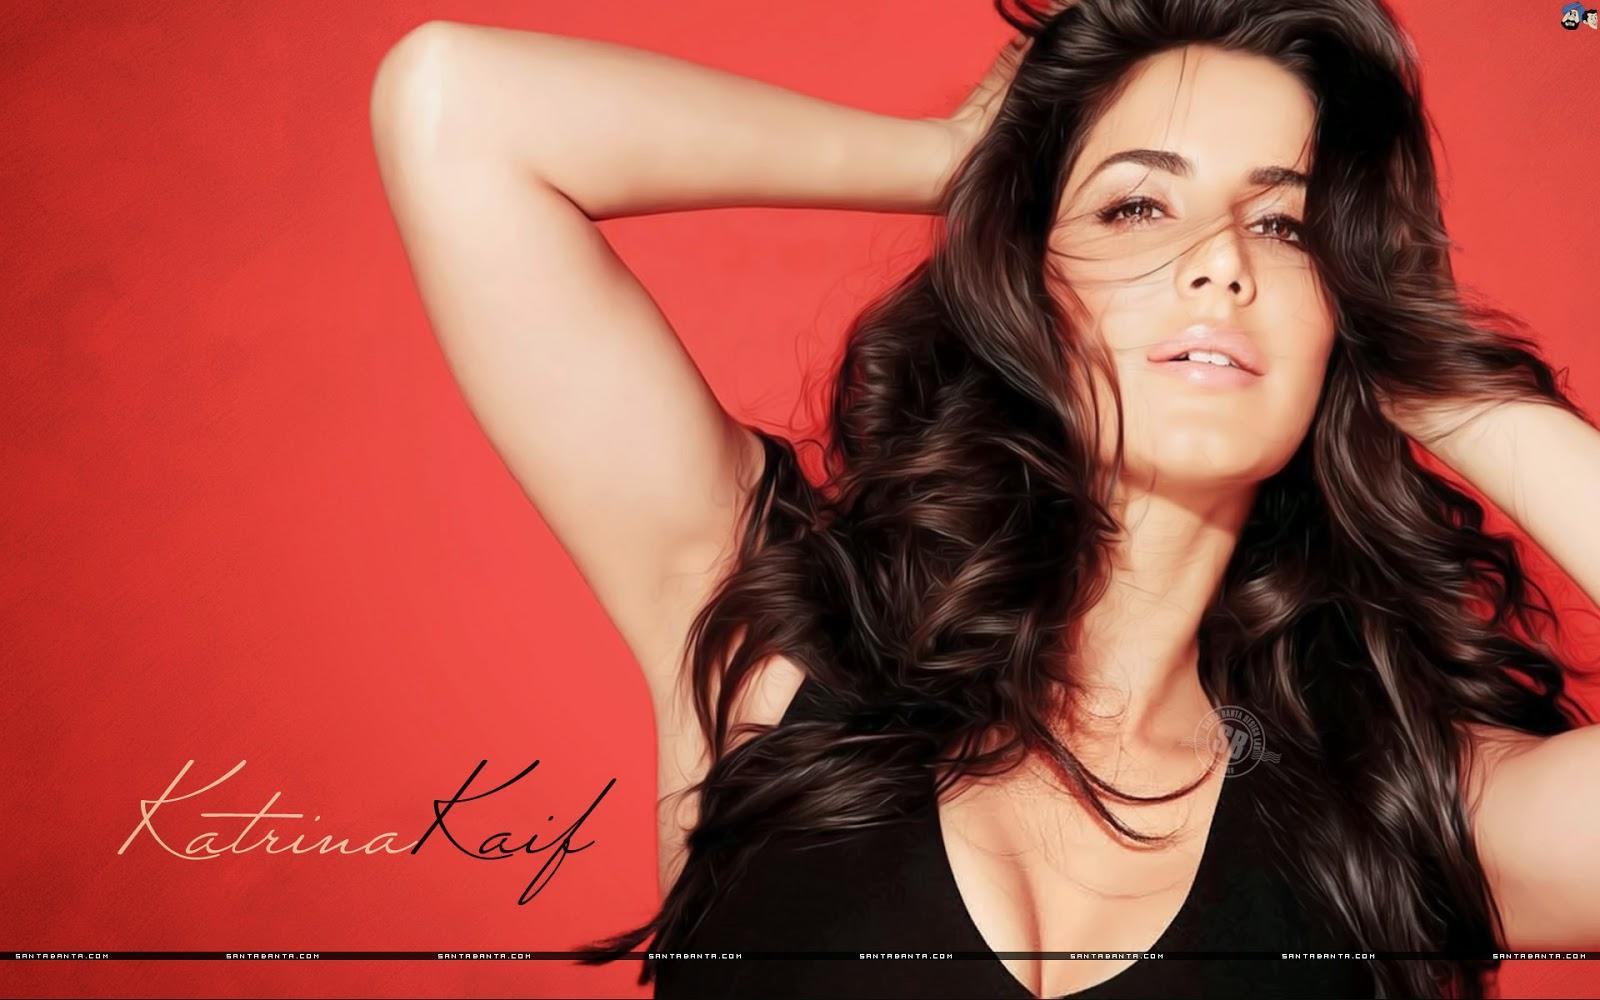 Katrina Kaif Seksi Wallpaper 20